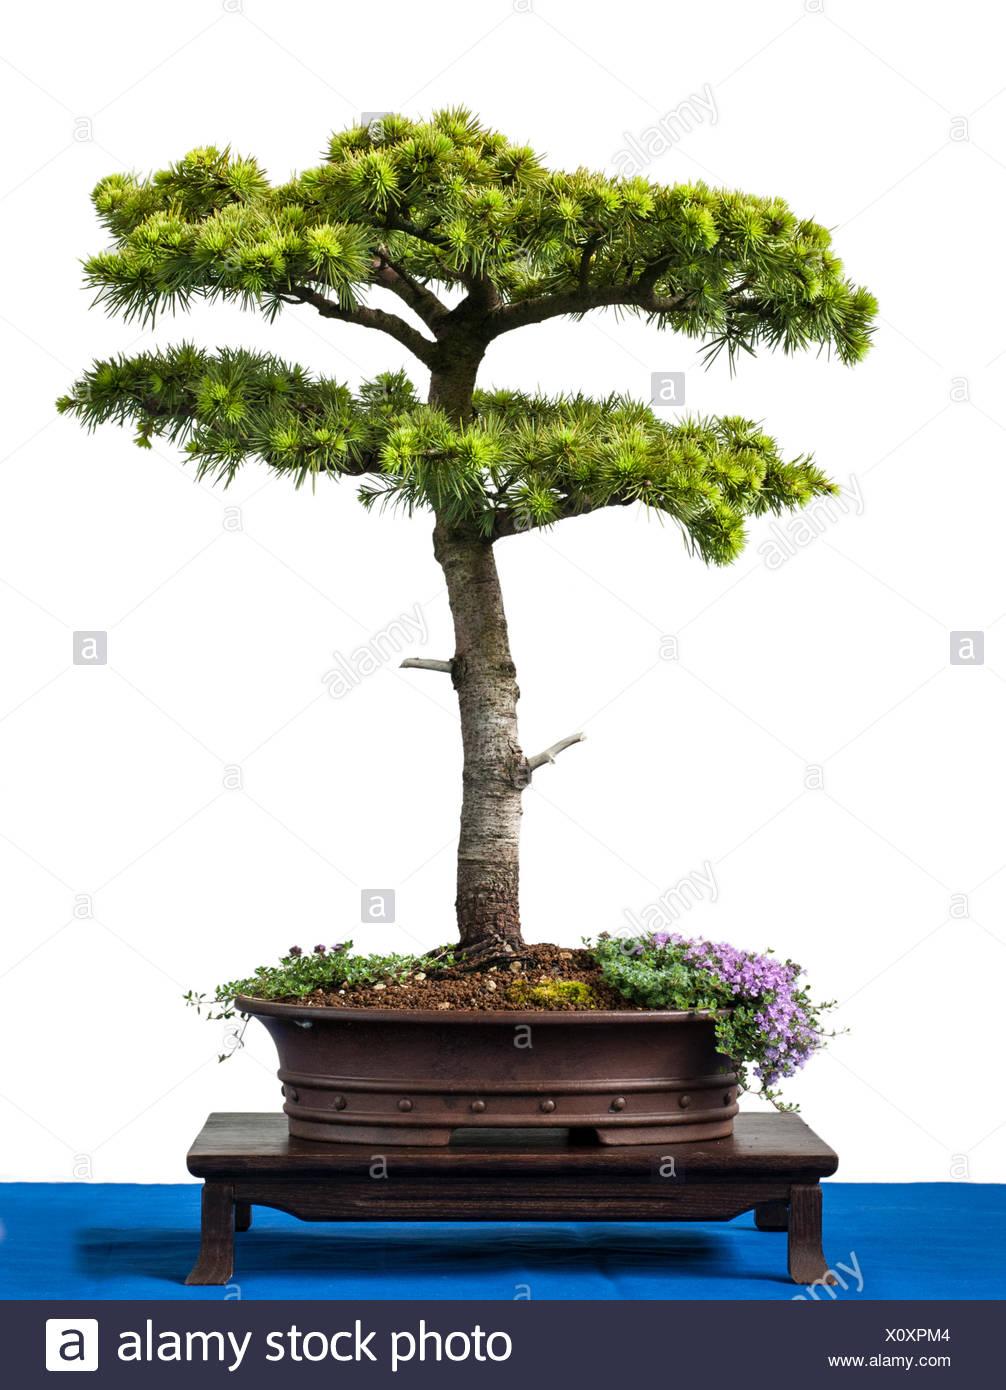 Conifer cyprus cedar as bonsai tree - Stock Image